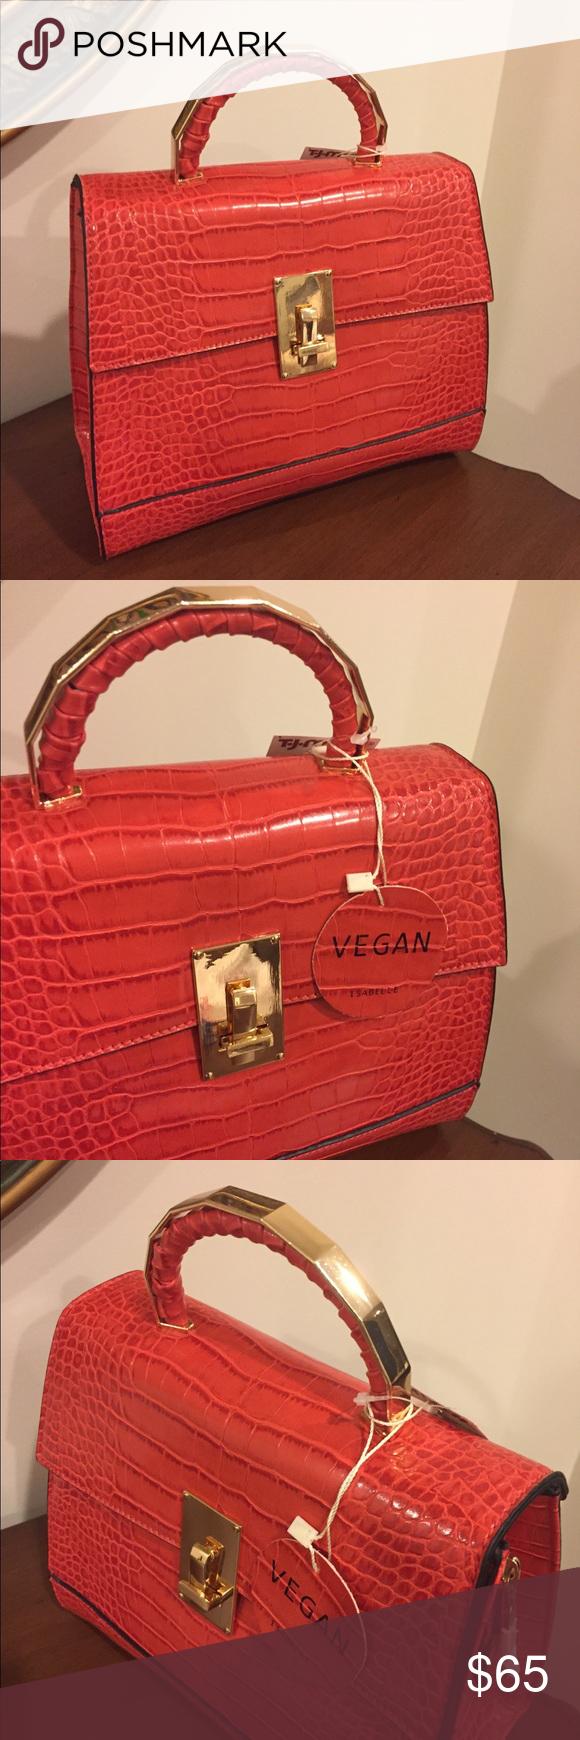 Nwt Isabelle Vegan Red Leather Handbag